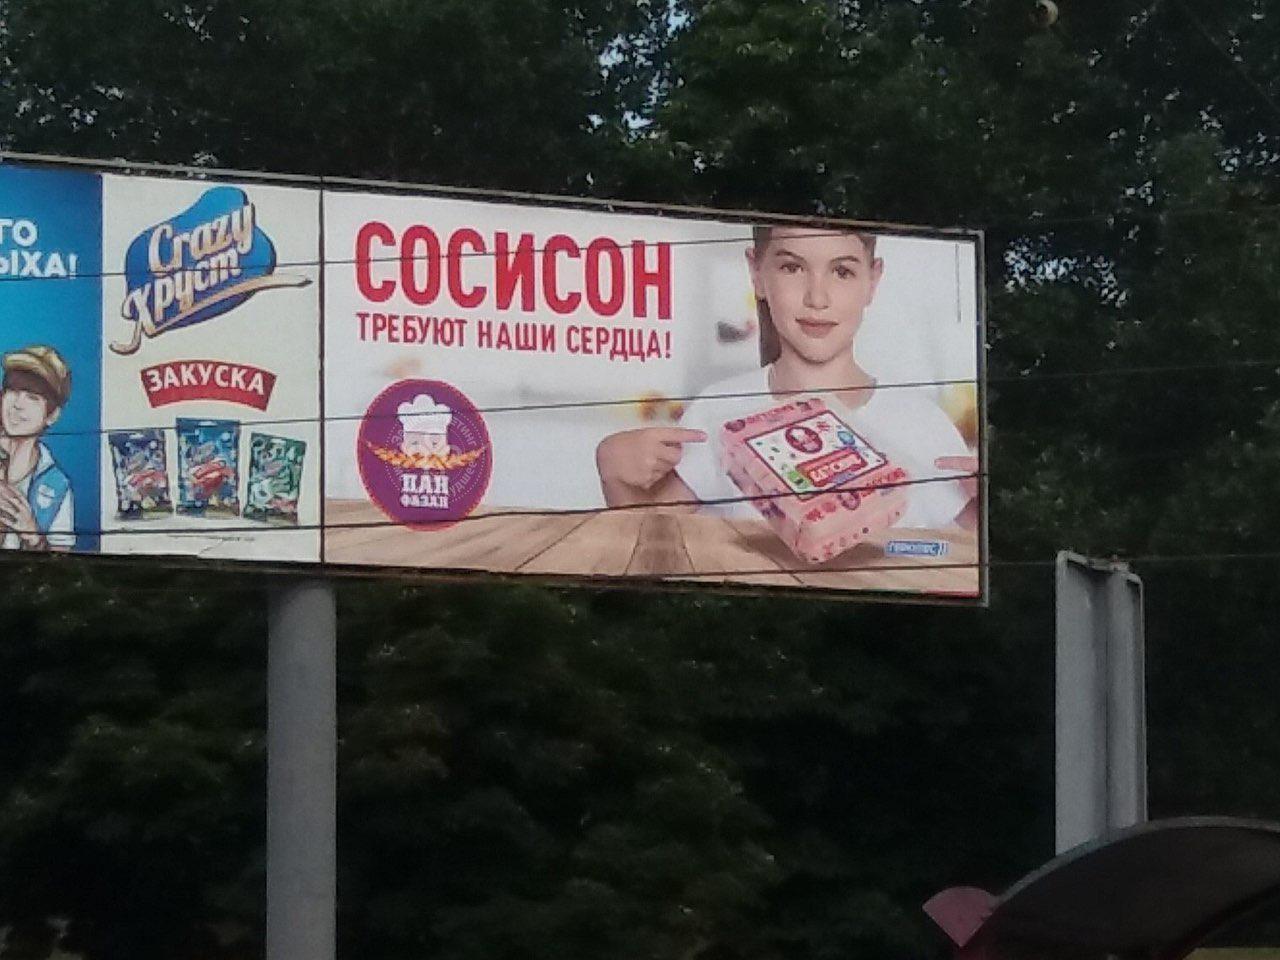 Сосисон прикол реклама щит